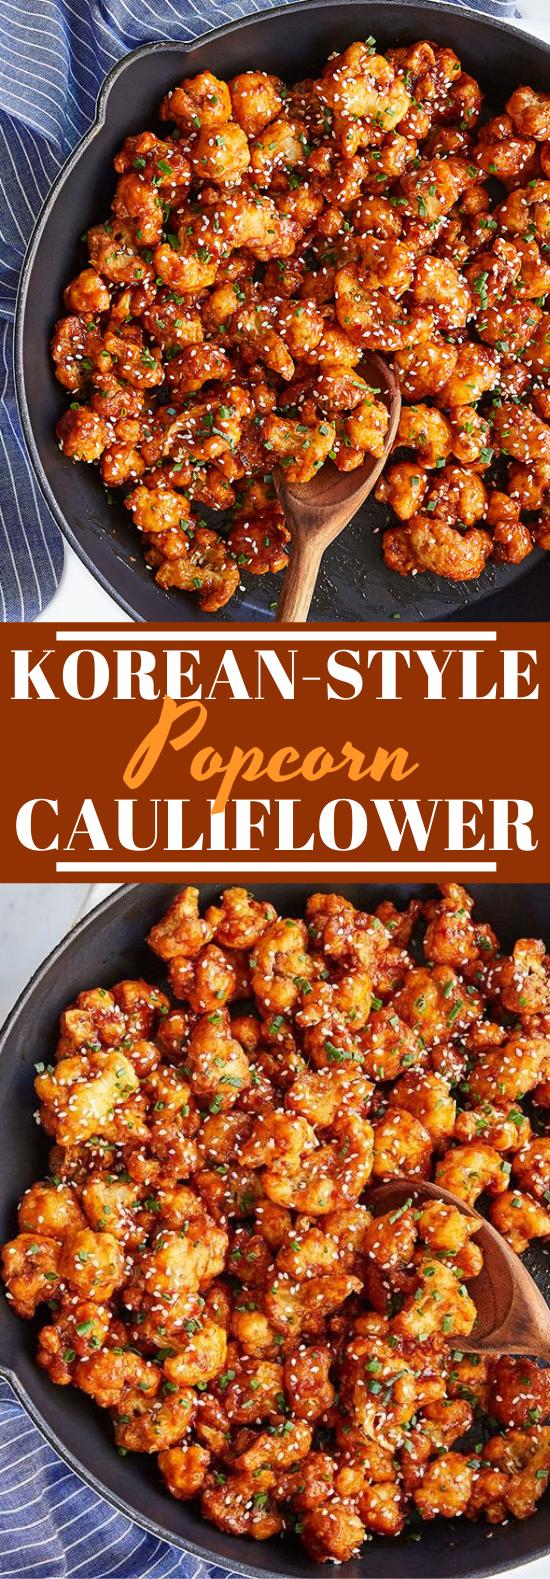 Korean-Style Popcorn Cauliflower #vegetarian #recipes #appetizers #cauliflower #meatless